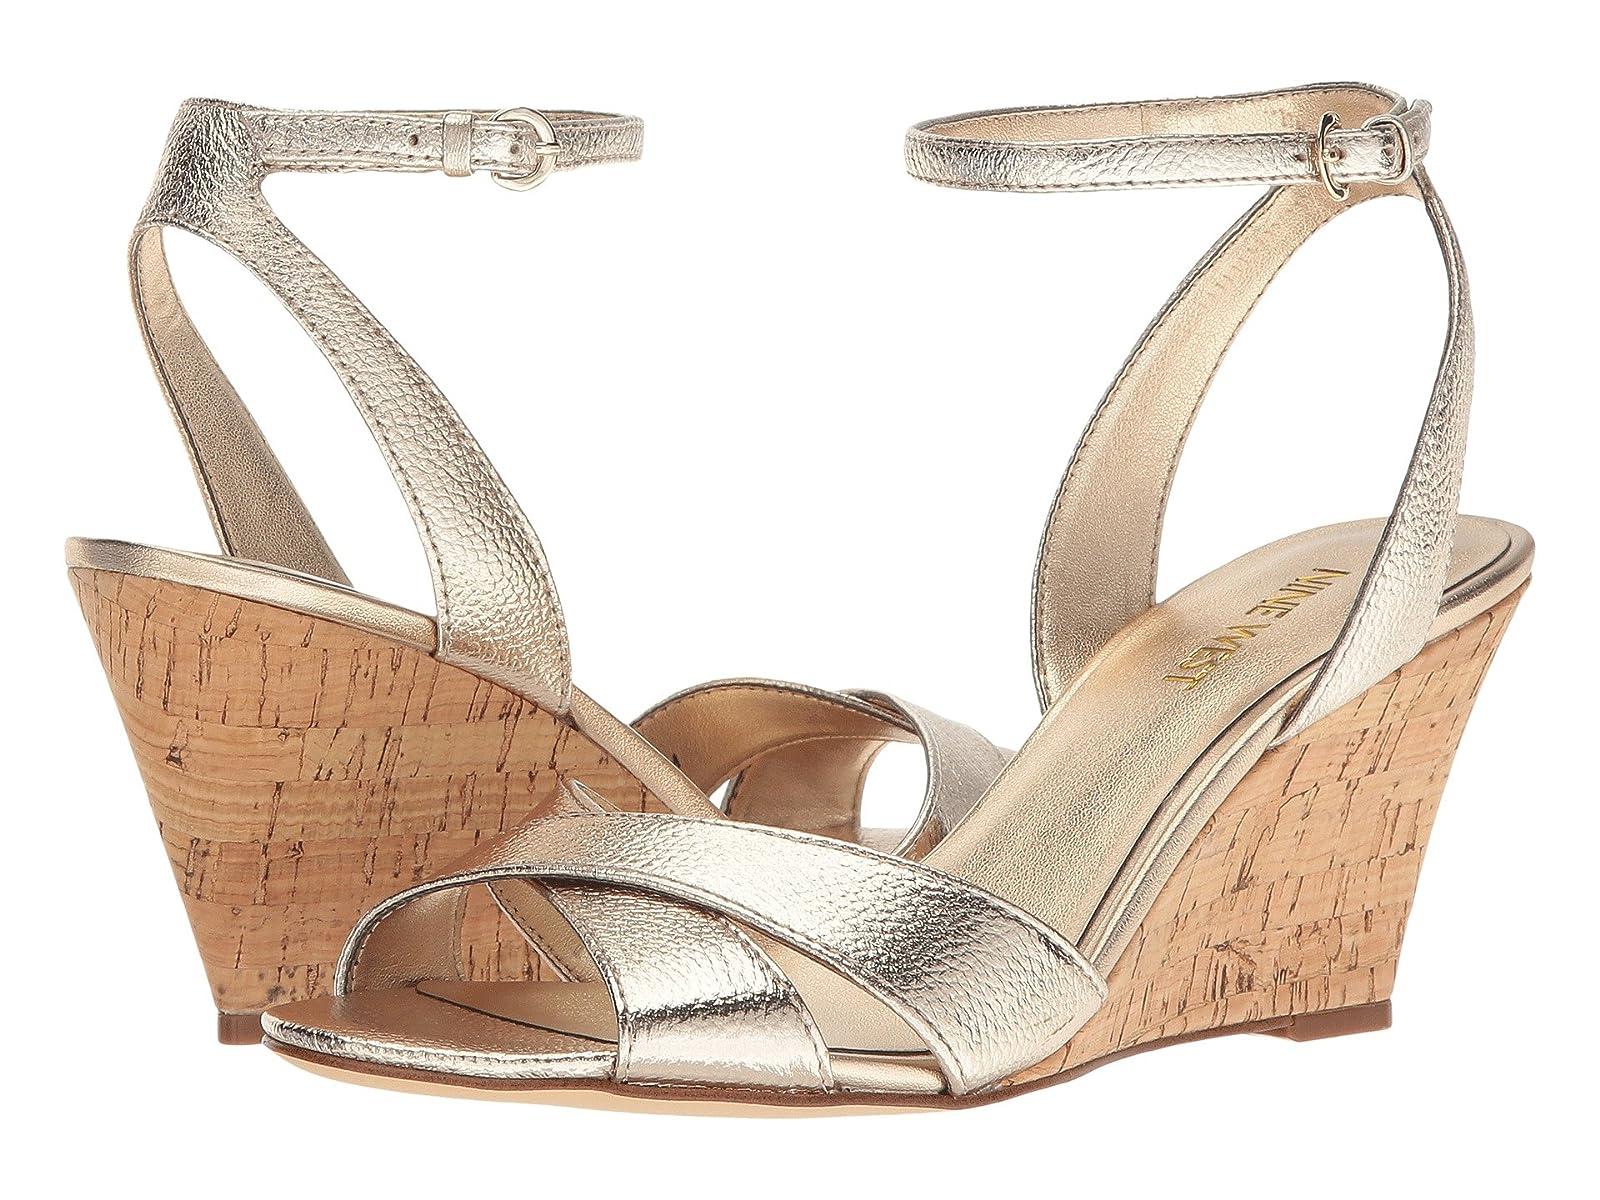 Nine West Kami Wedge SandalCheap and distinctive eye-catching shoes